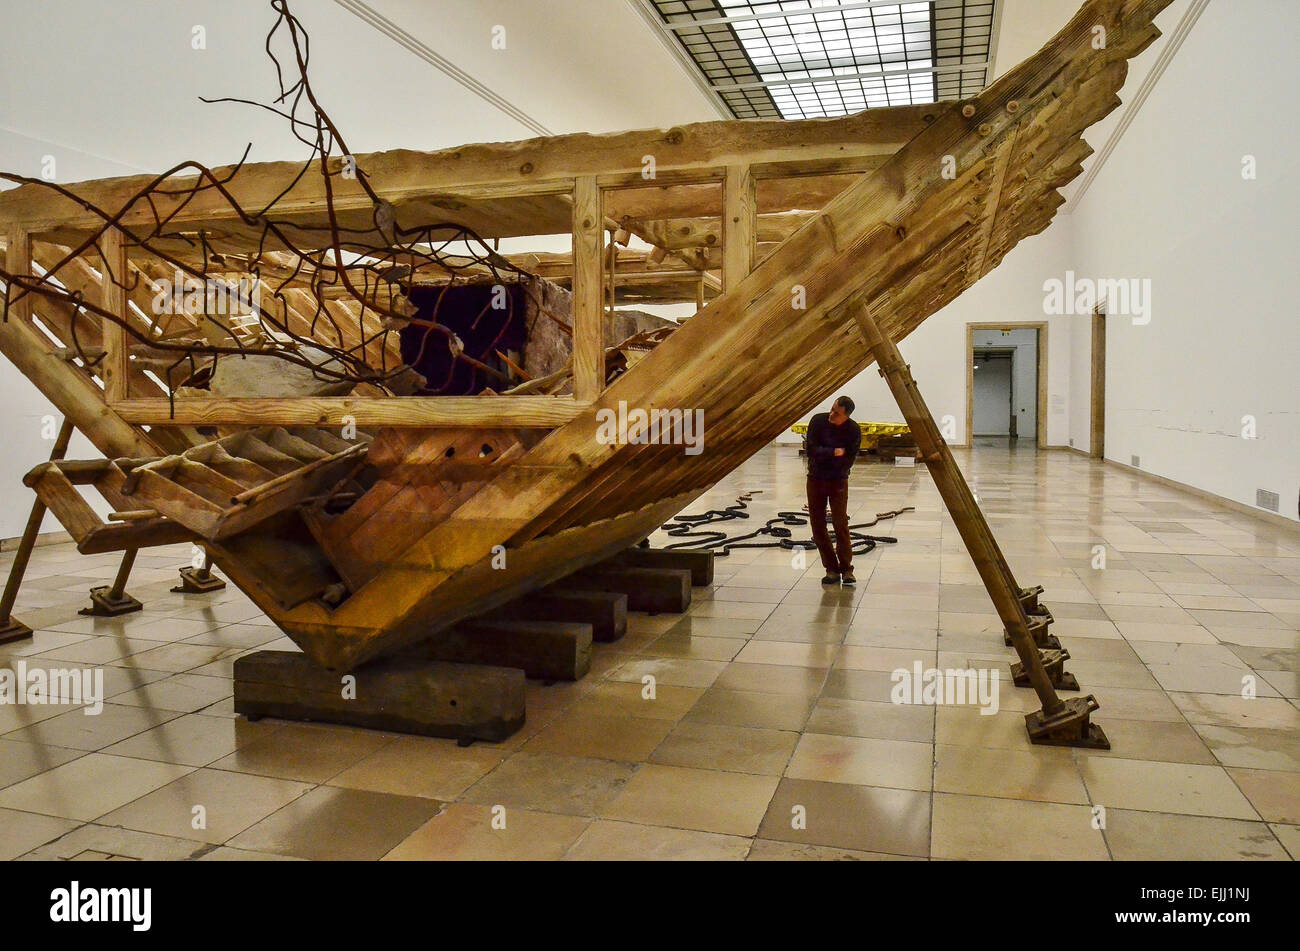 Matthew Barney, Boat of Ra 2014,River of Fundament, a Gesamtkunstwerk, Haus der Kunst, Munich , 2014 - Stock Image